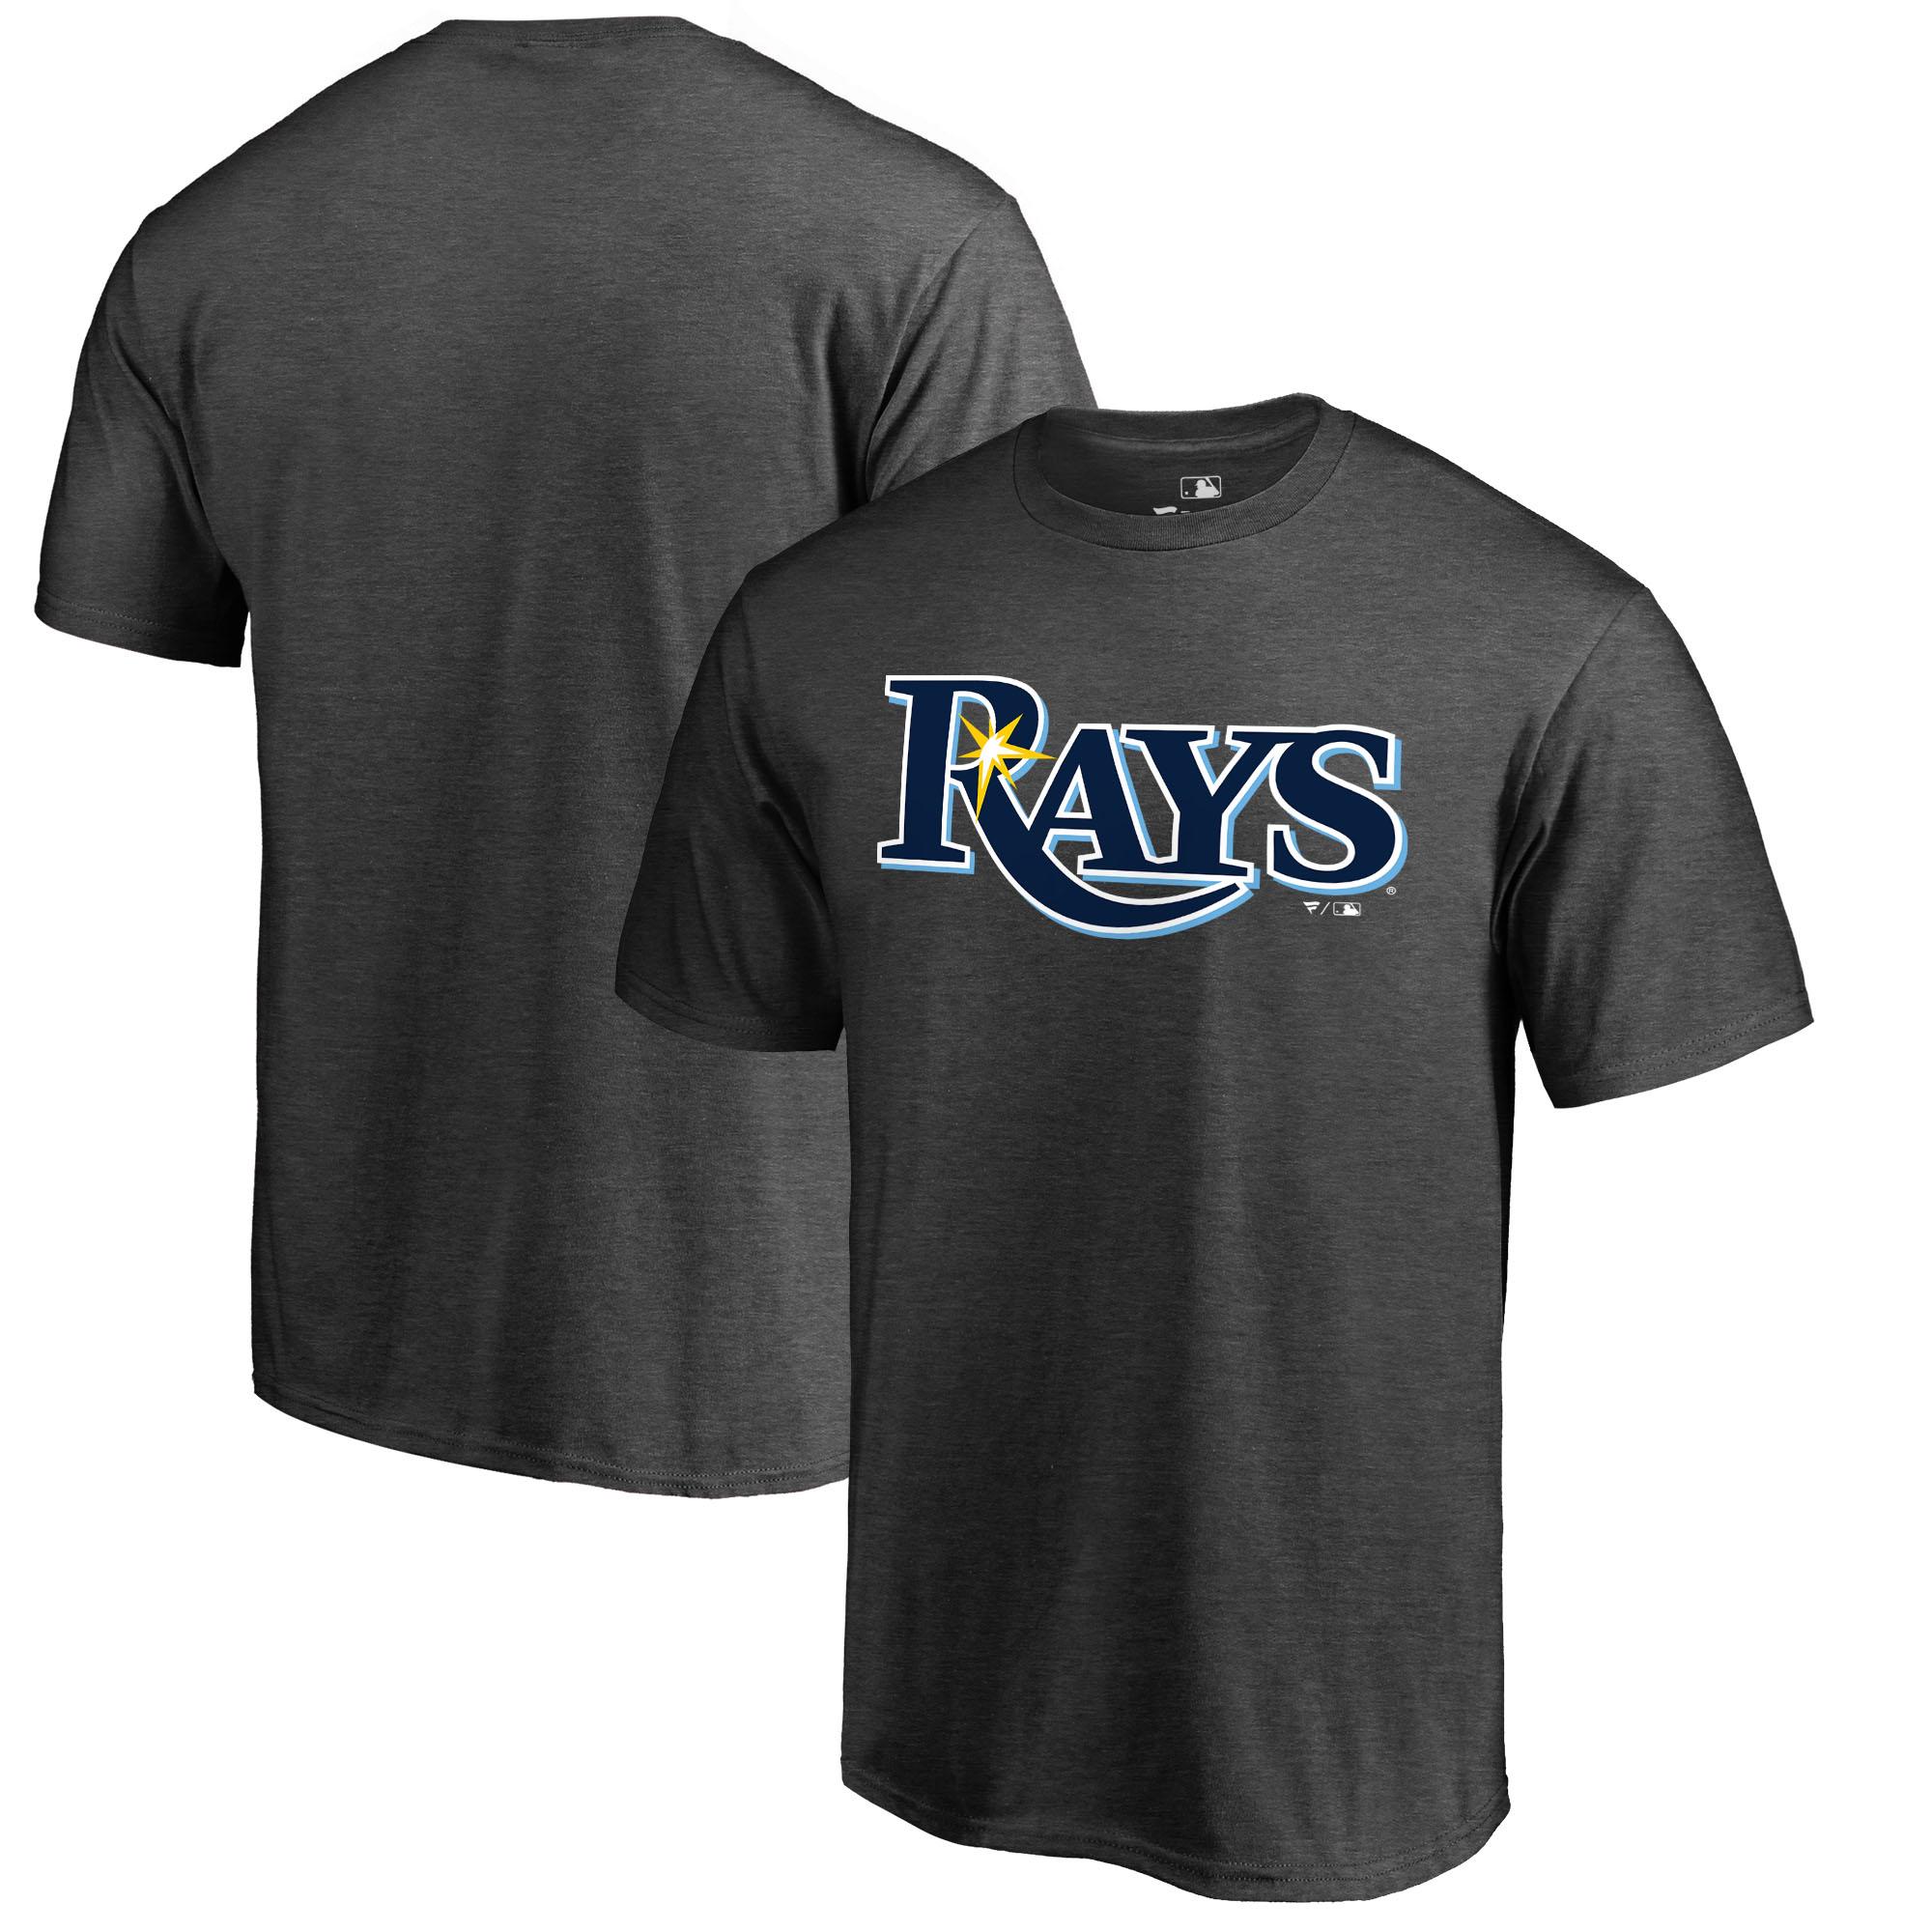 Tampa Bay Rays Fanatics Branded Primary Logo T-Shirt - Heathered Charcoal